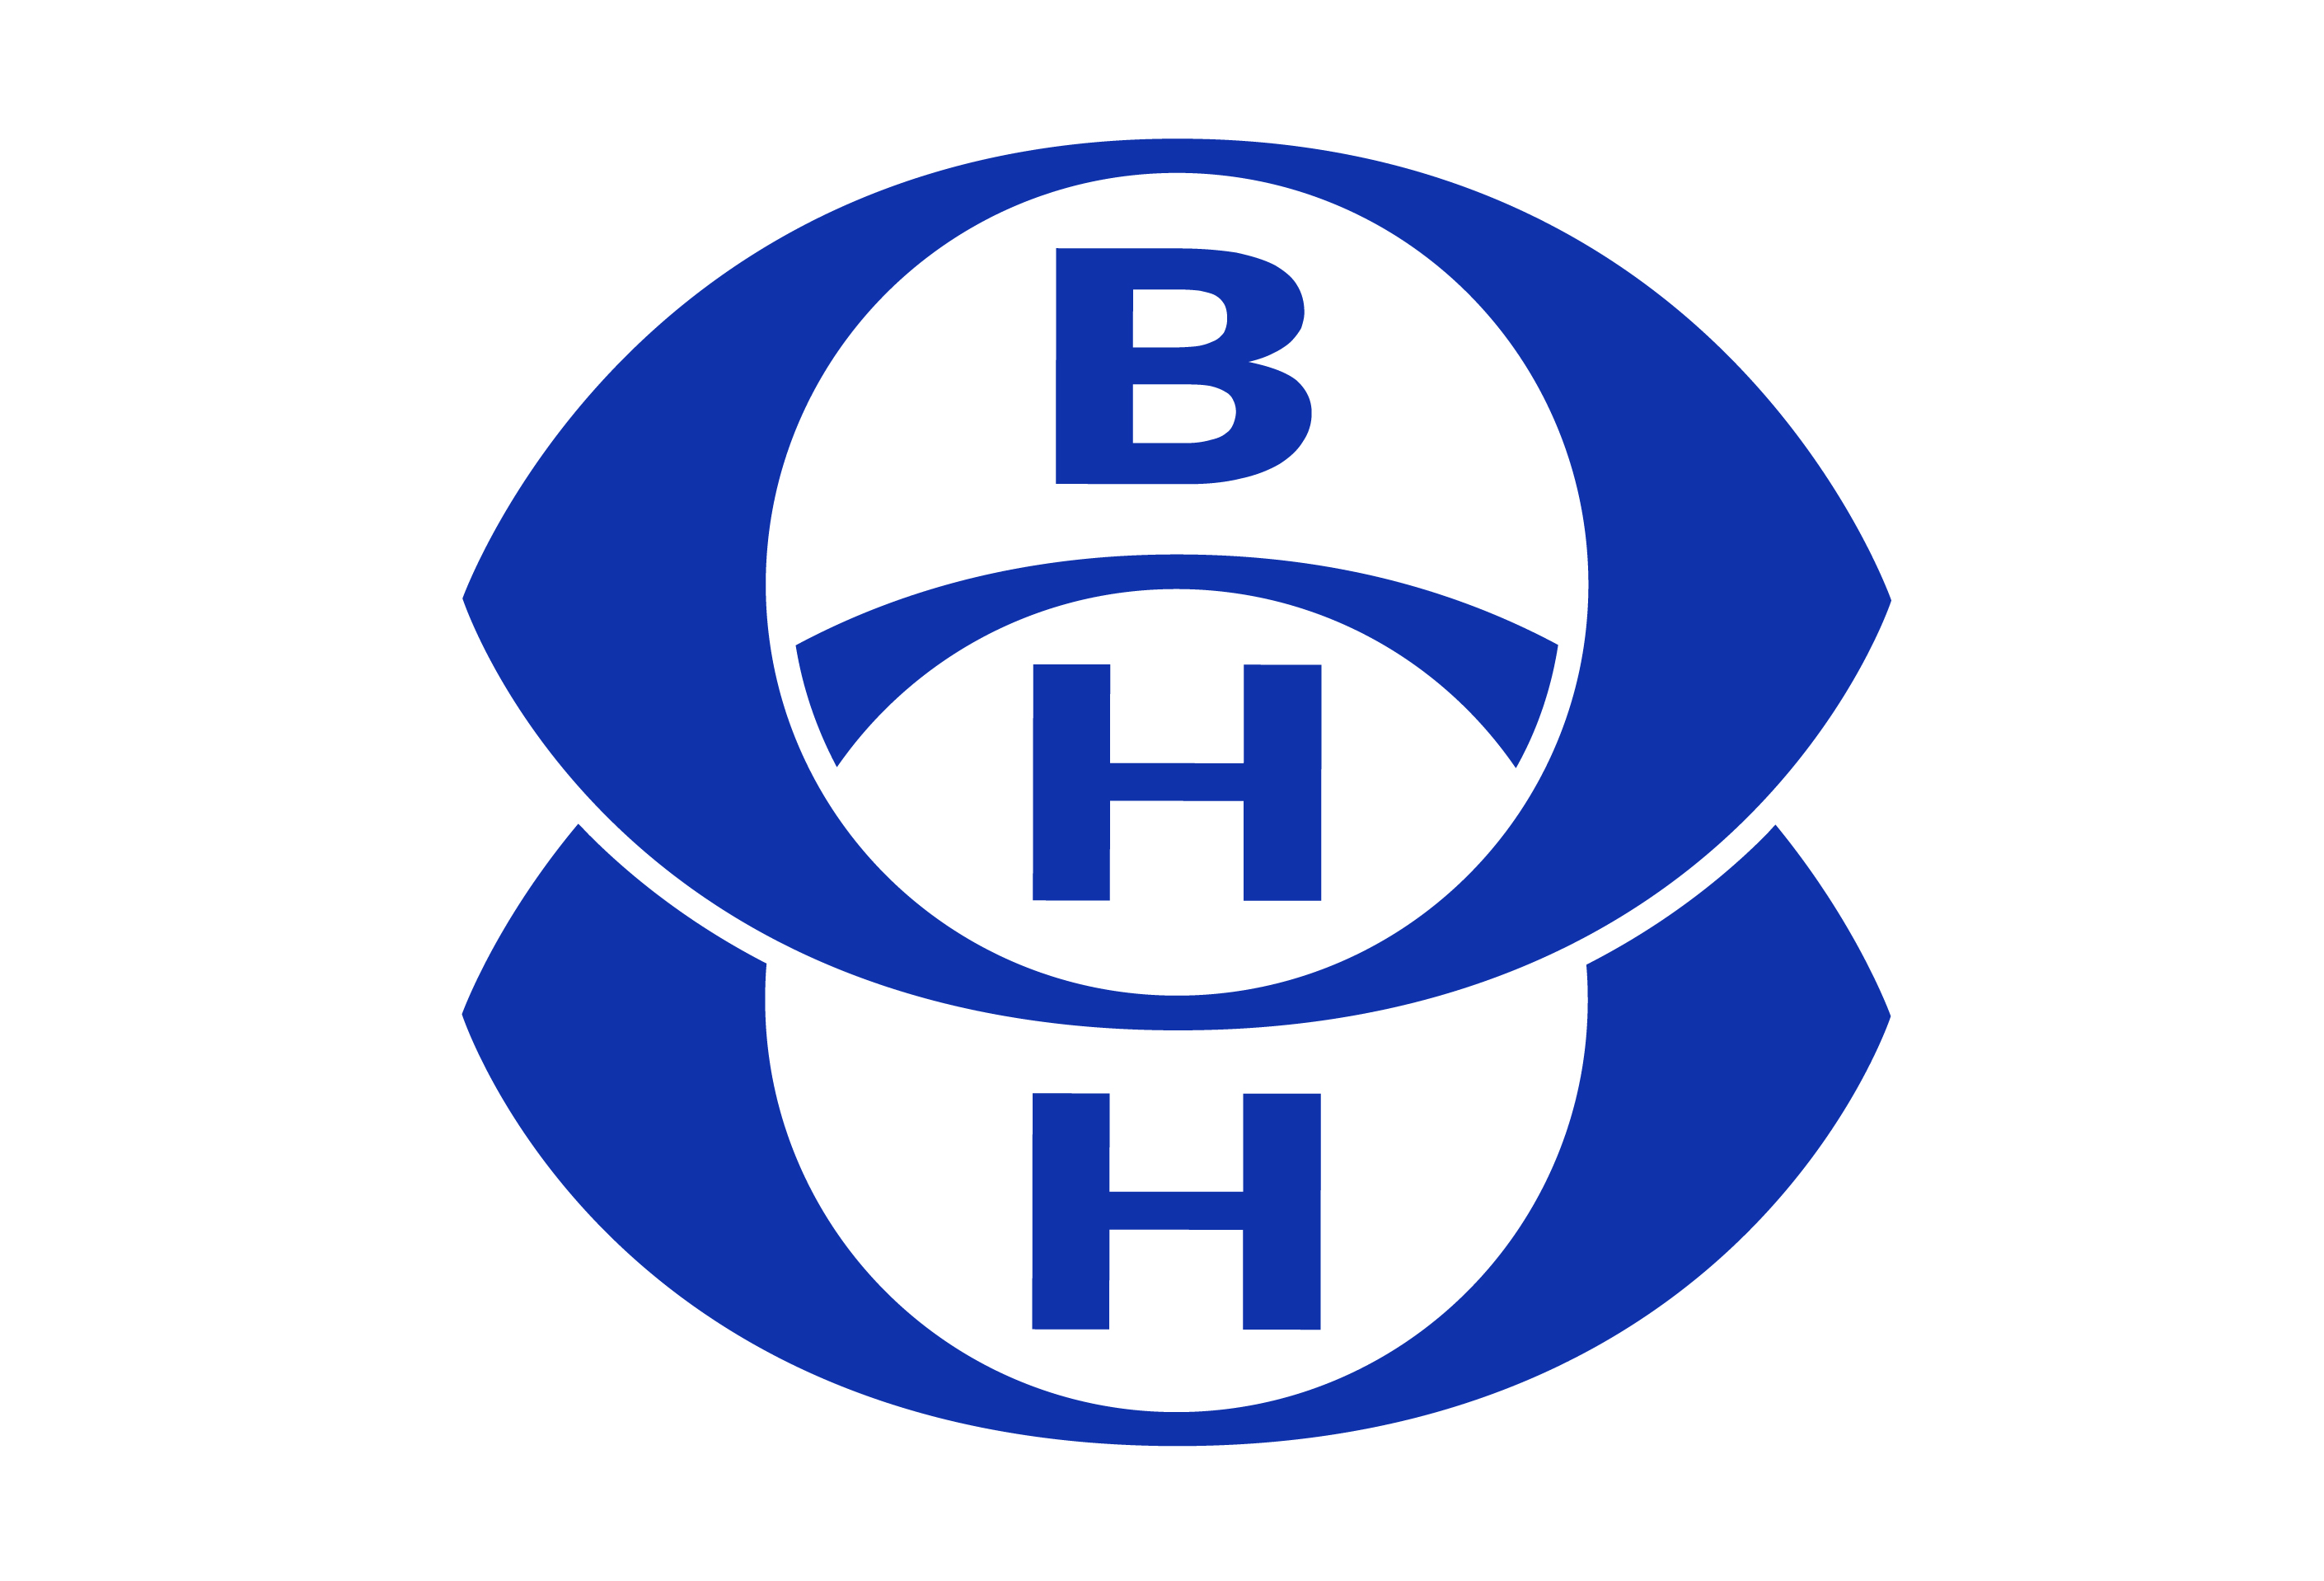 BAN HOCK HIN CO PTE LTD